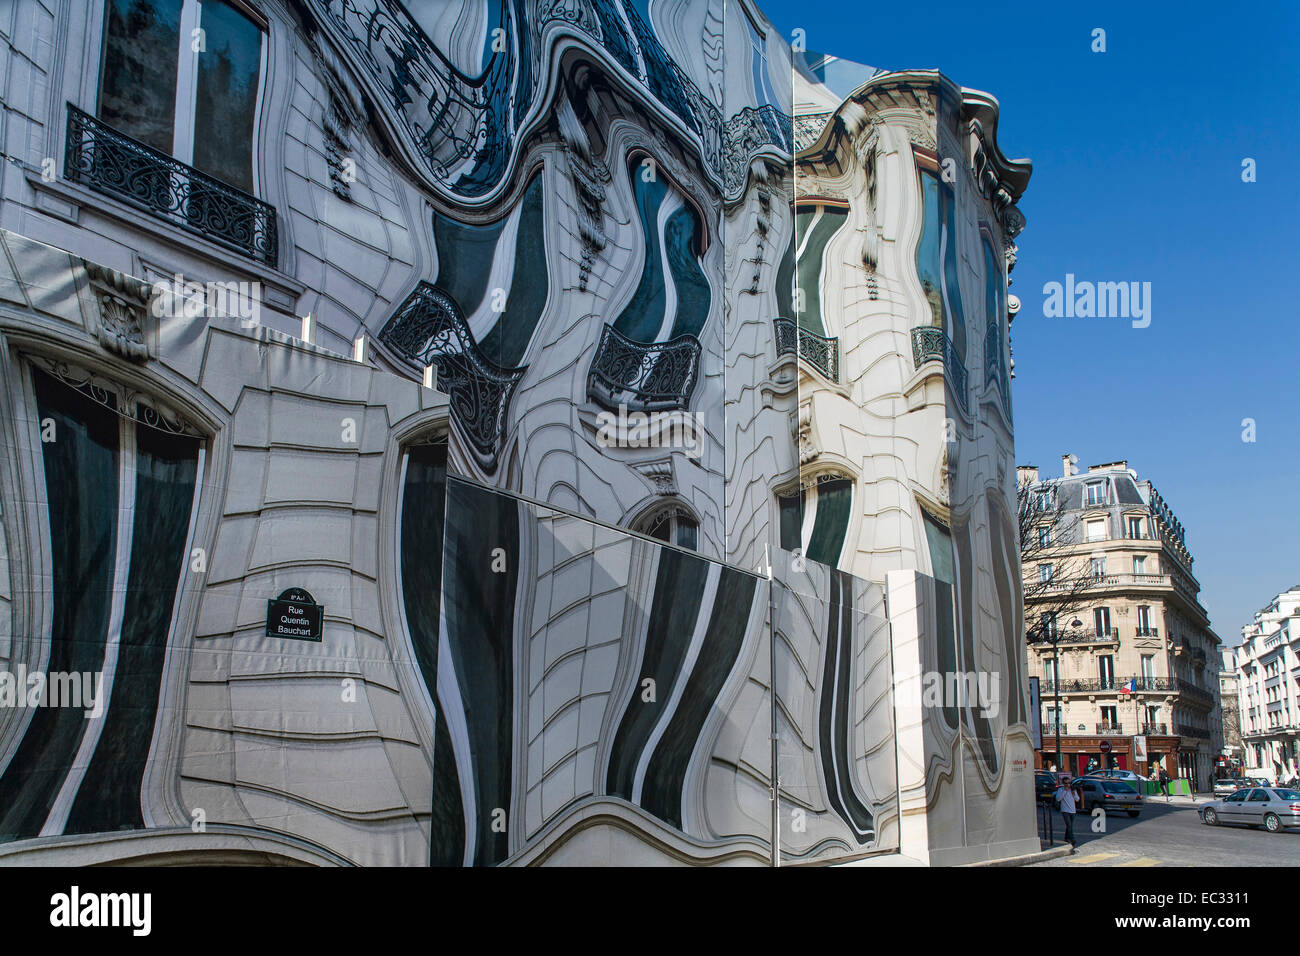 france paris covering of a building under renovation trompe l 39 oeil stock photo 76285581 alamy. Black Bedroom Furniture Sets. Home Design Ideas